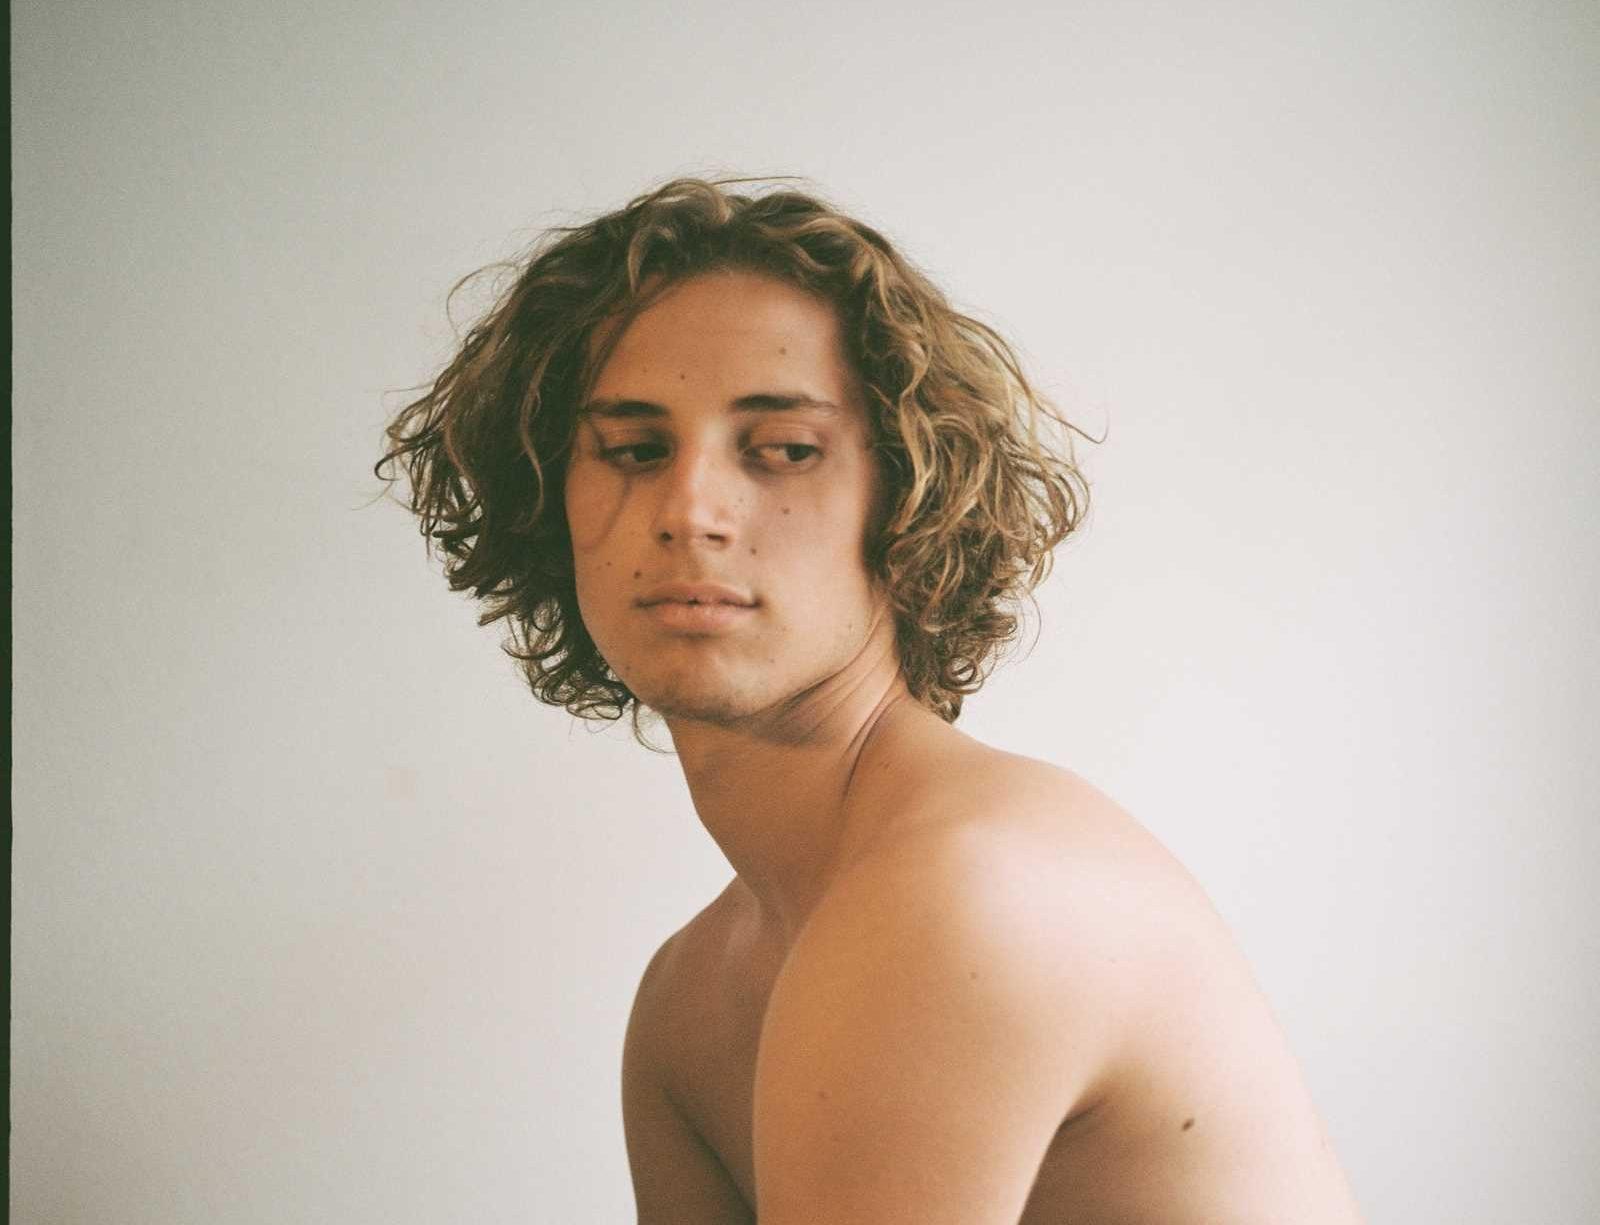 Jacob Ebrahim by Hannes Gade Jacob Ebrahim by Hannes Gade Vanity Teen 虚荣青年 Lifestyle & new faces magazine